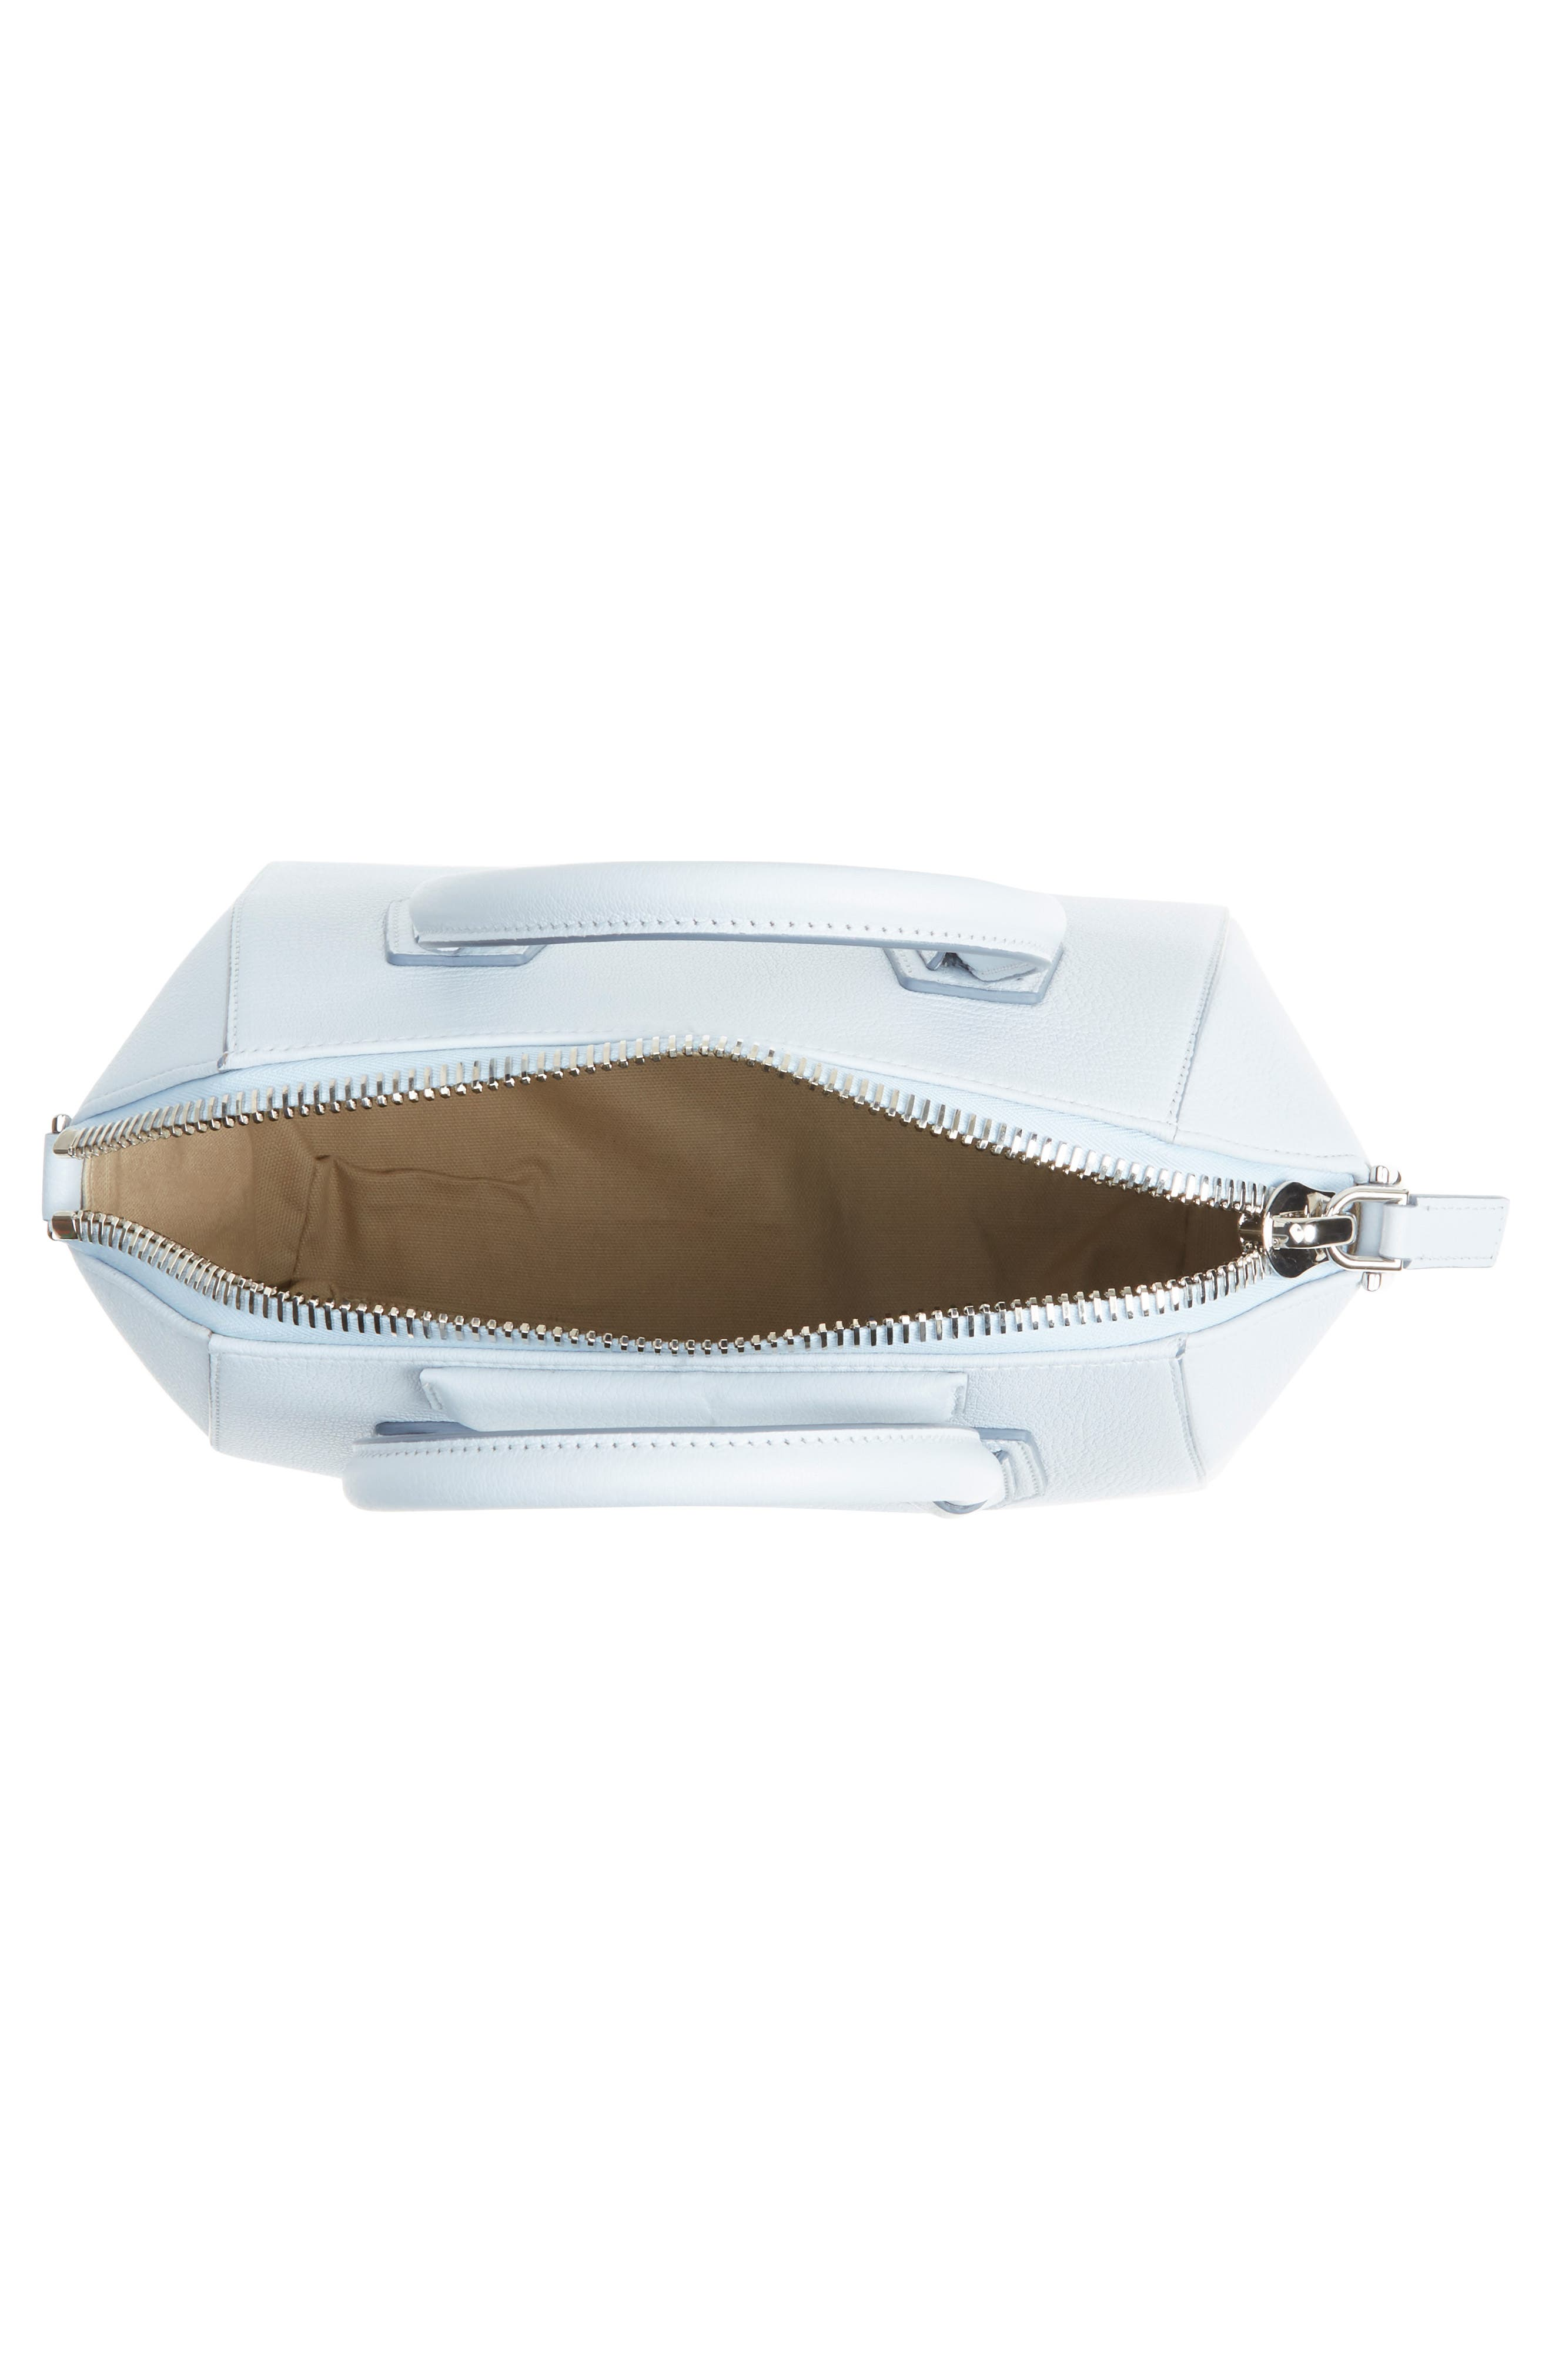 Alternate Image 3  - Givenchy 'Small Antigona' Leather Satchel